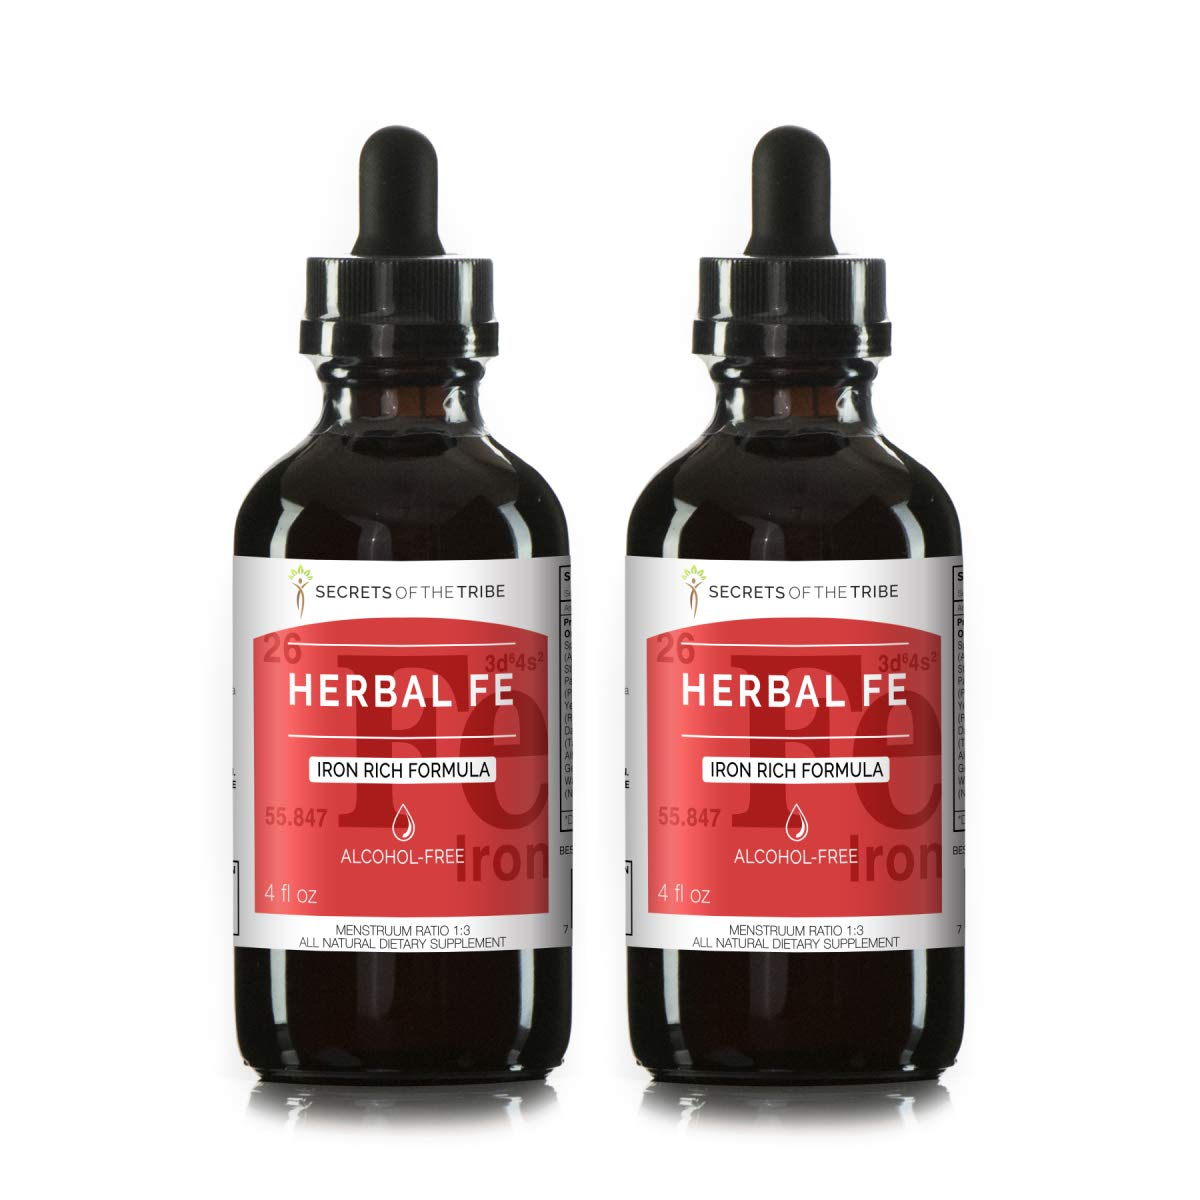 Herbal Fe Alcohol-Free Extract, Spirulina, Stinging Nettle, Parsley, Yellow Dock, Dandelion, Alfalfa, Gentian, Watercress. Glycerite Tincture Iron Rich Formula (2x4 fl oz)